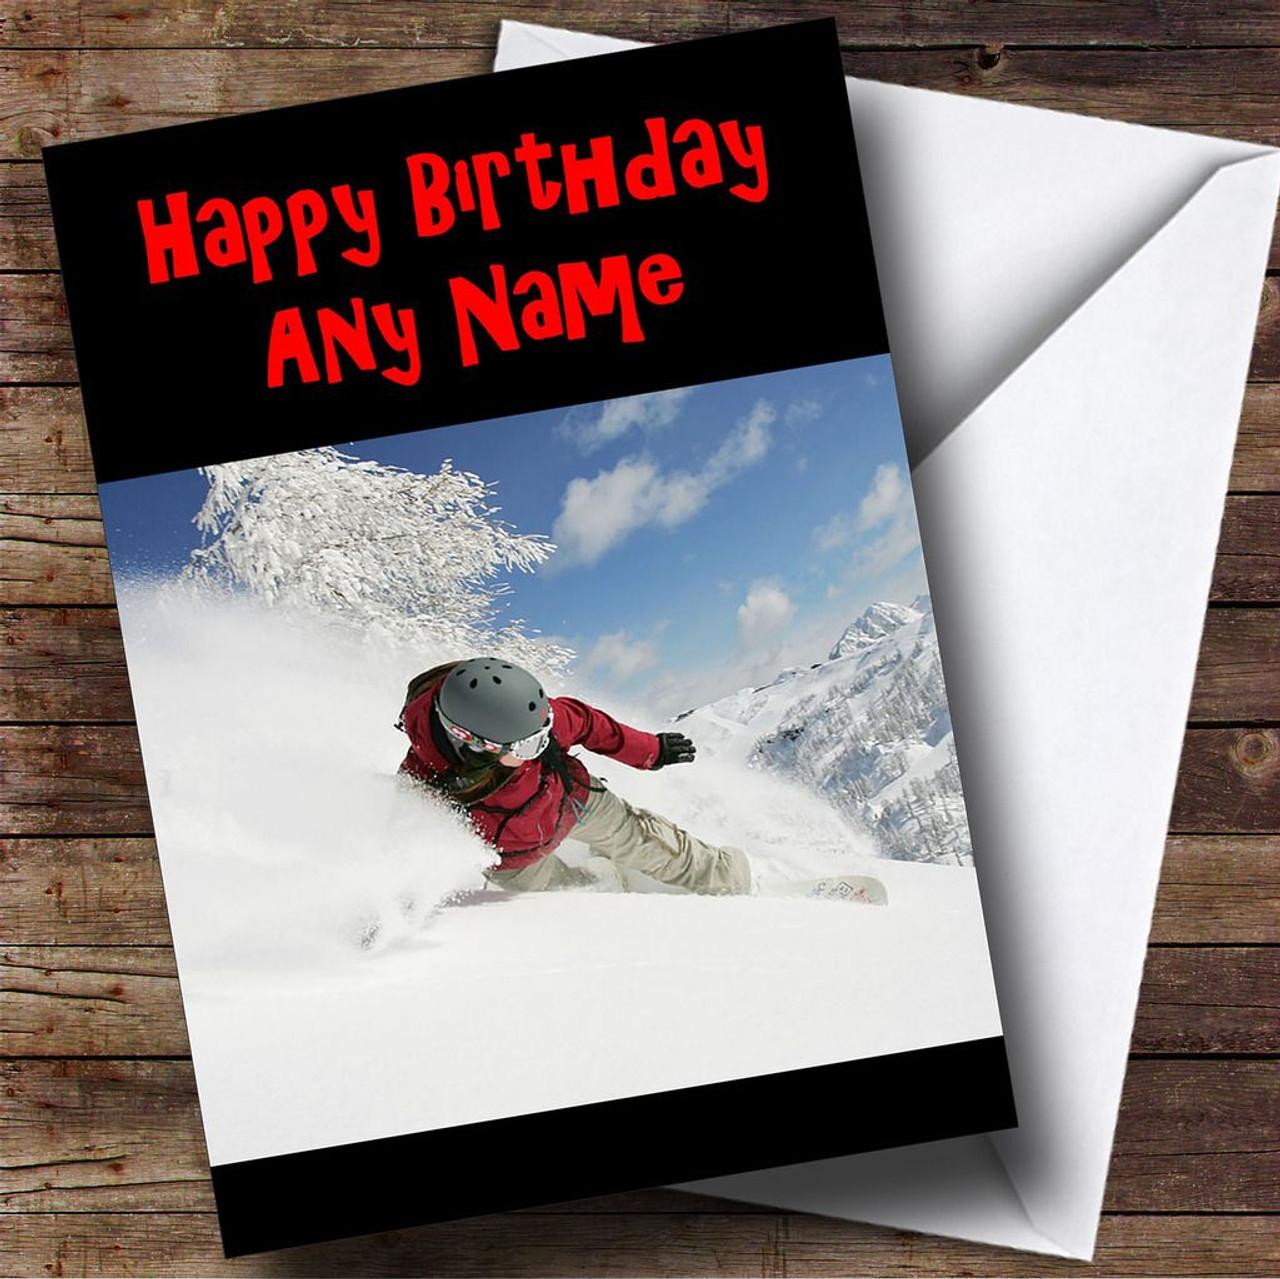 Snowboarding Personalised Birthday Card The Card Zoo – Numberjacks Birthday Card